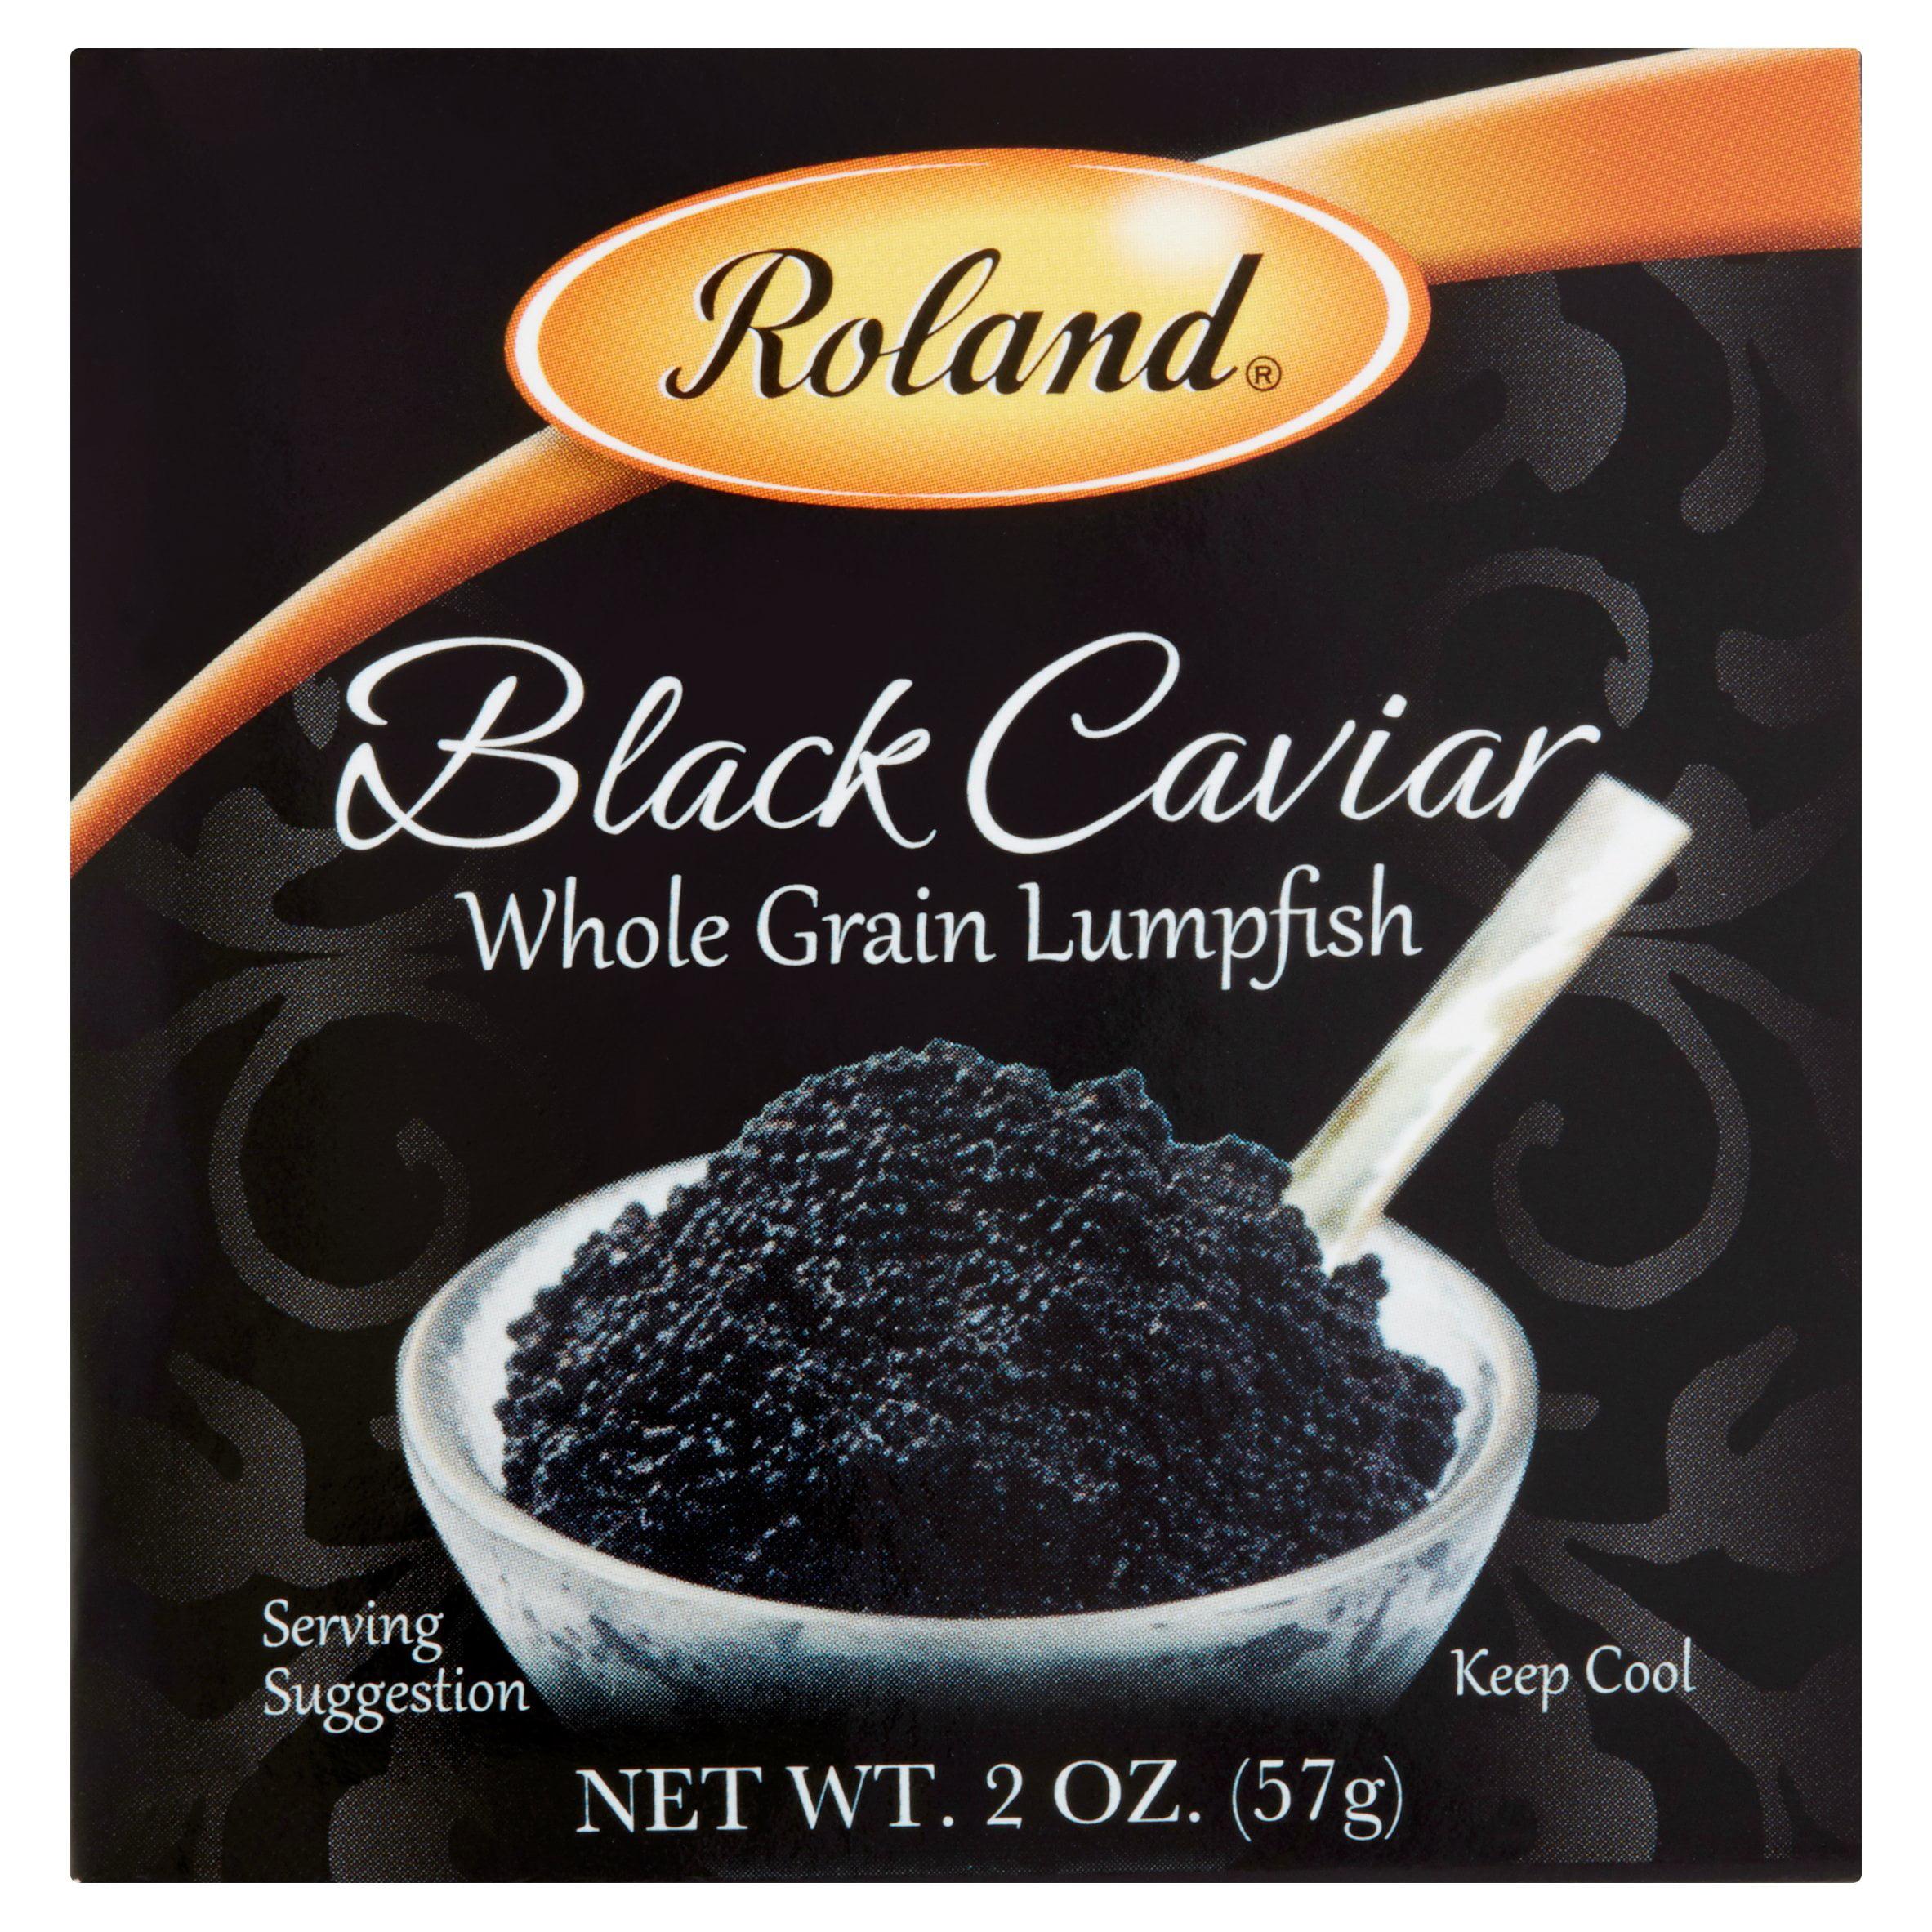 Roland Black Caviar Whole Grain Lumpfish, 2 oz by American Roland Food Corp.